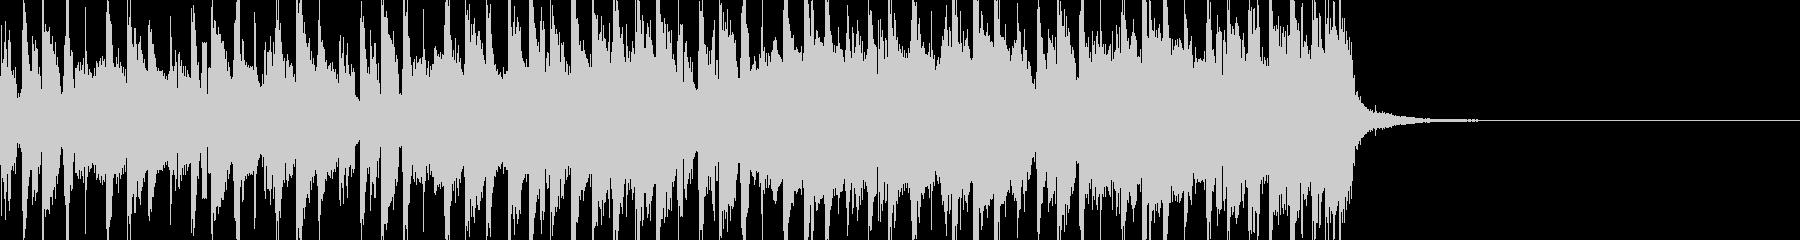 CM映像:近未来的アンビエント15secの未再生の波形